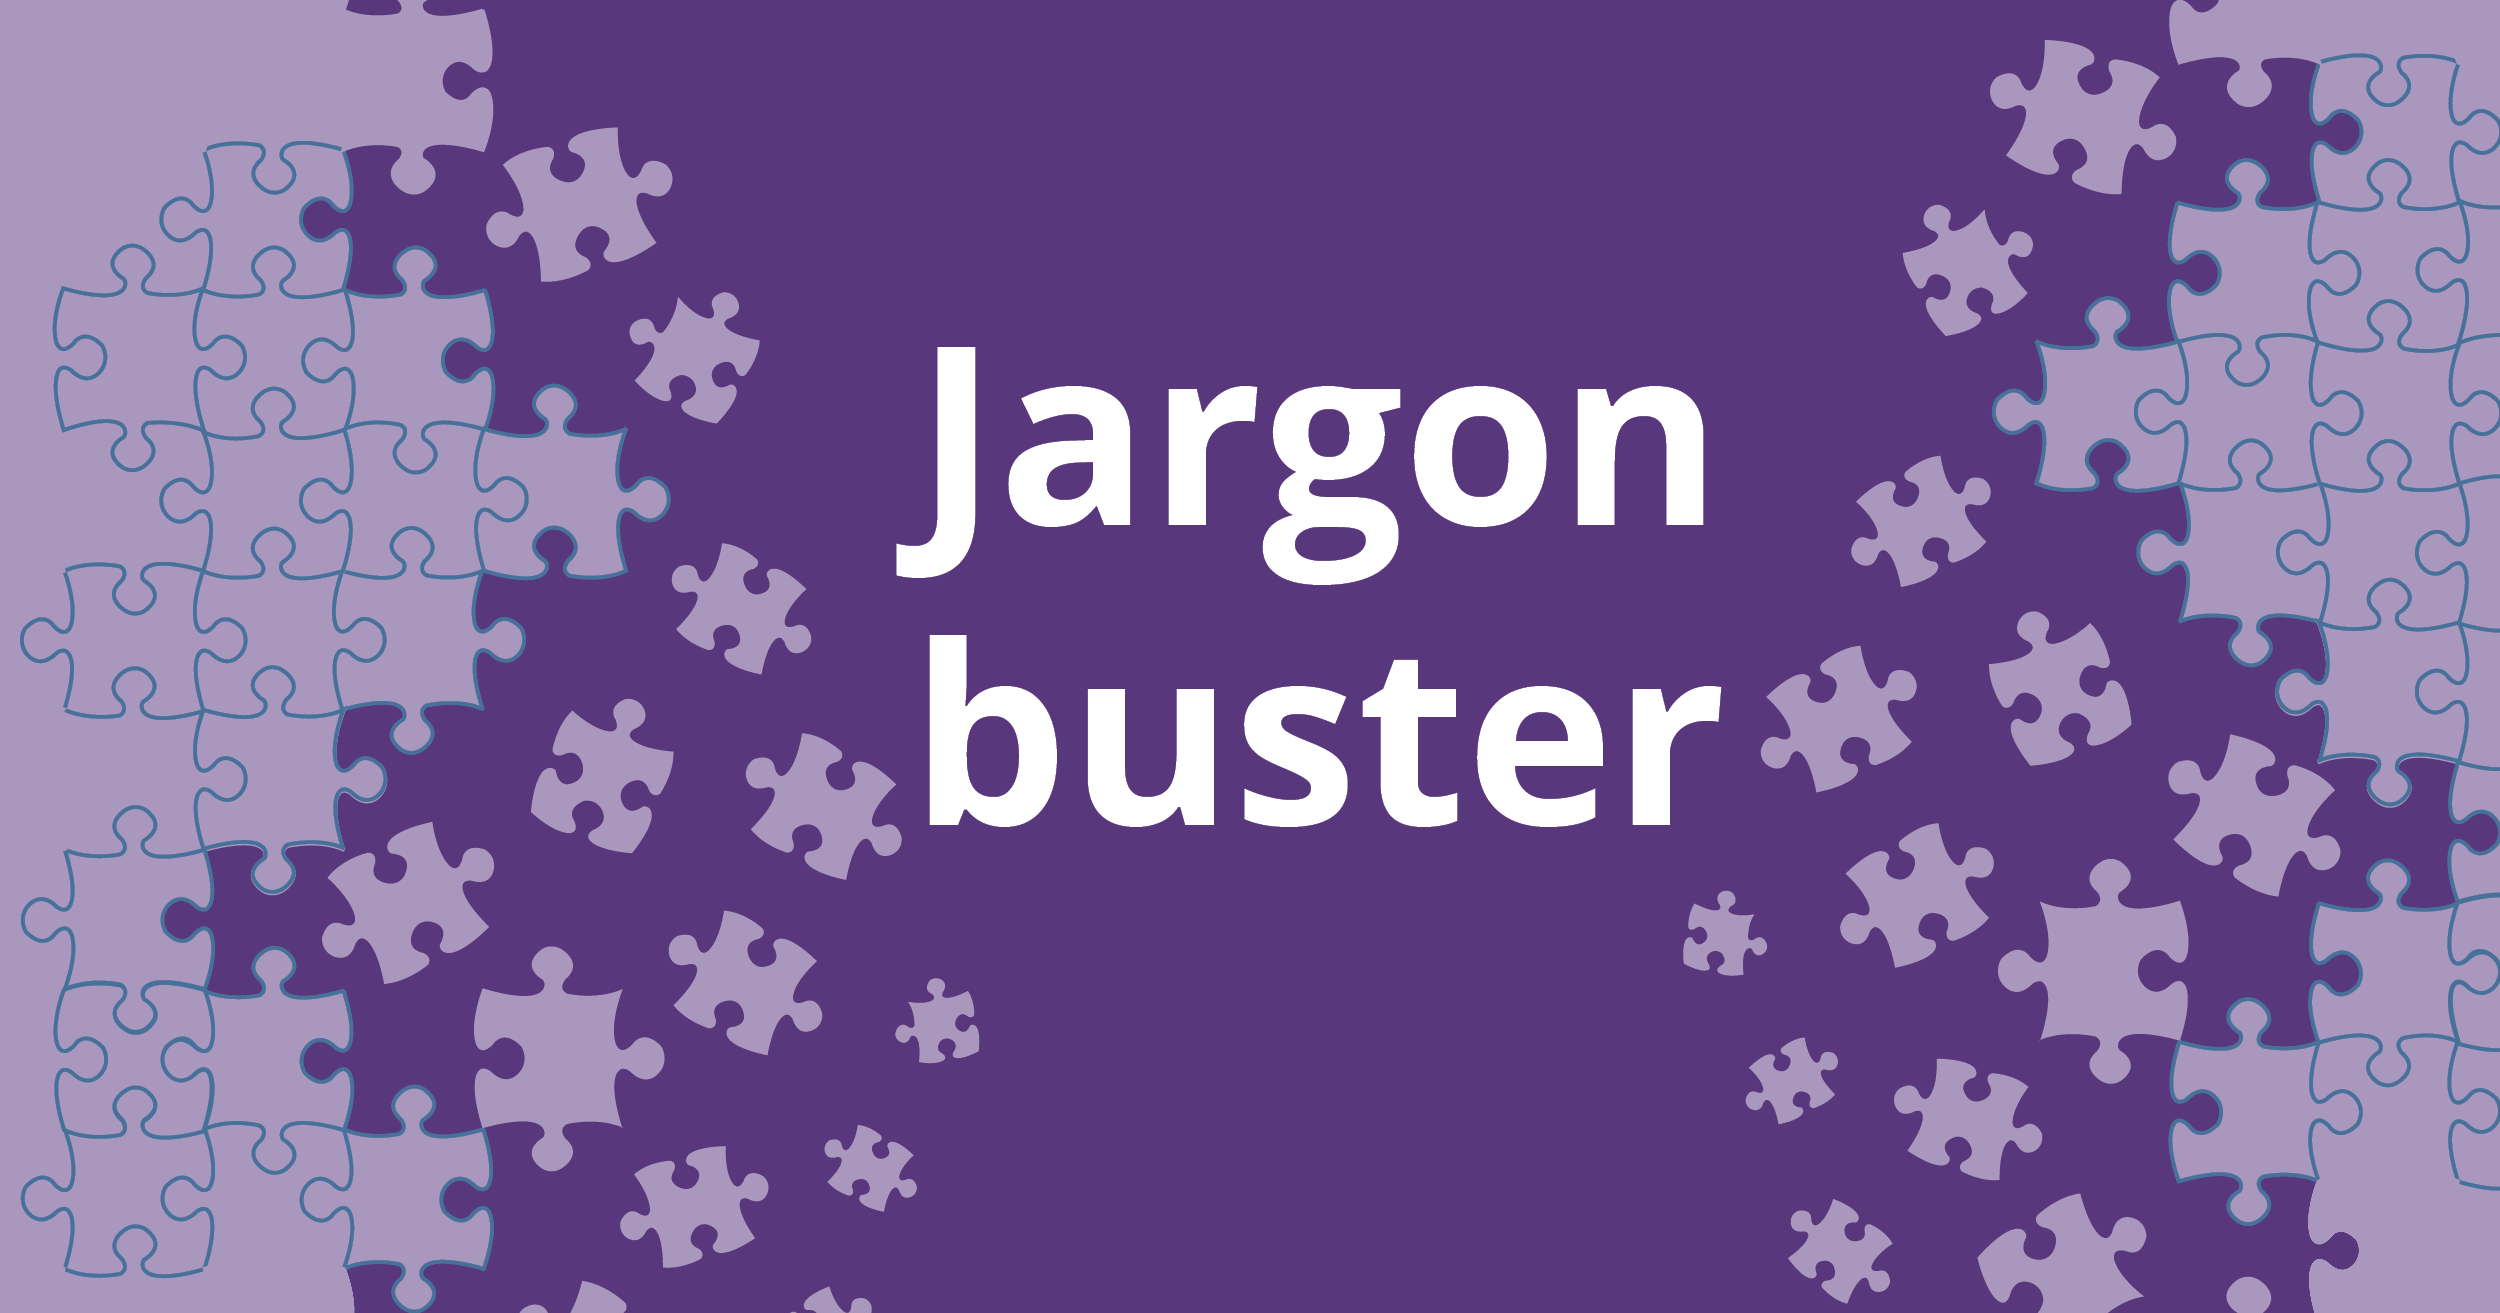 Autism jargon buster